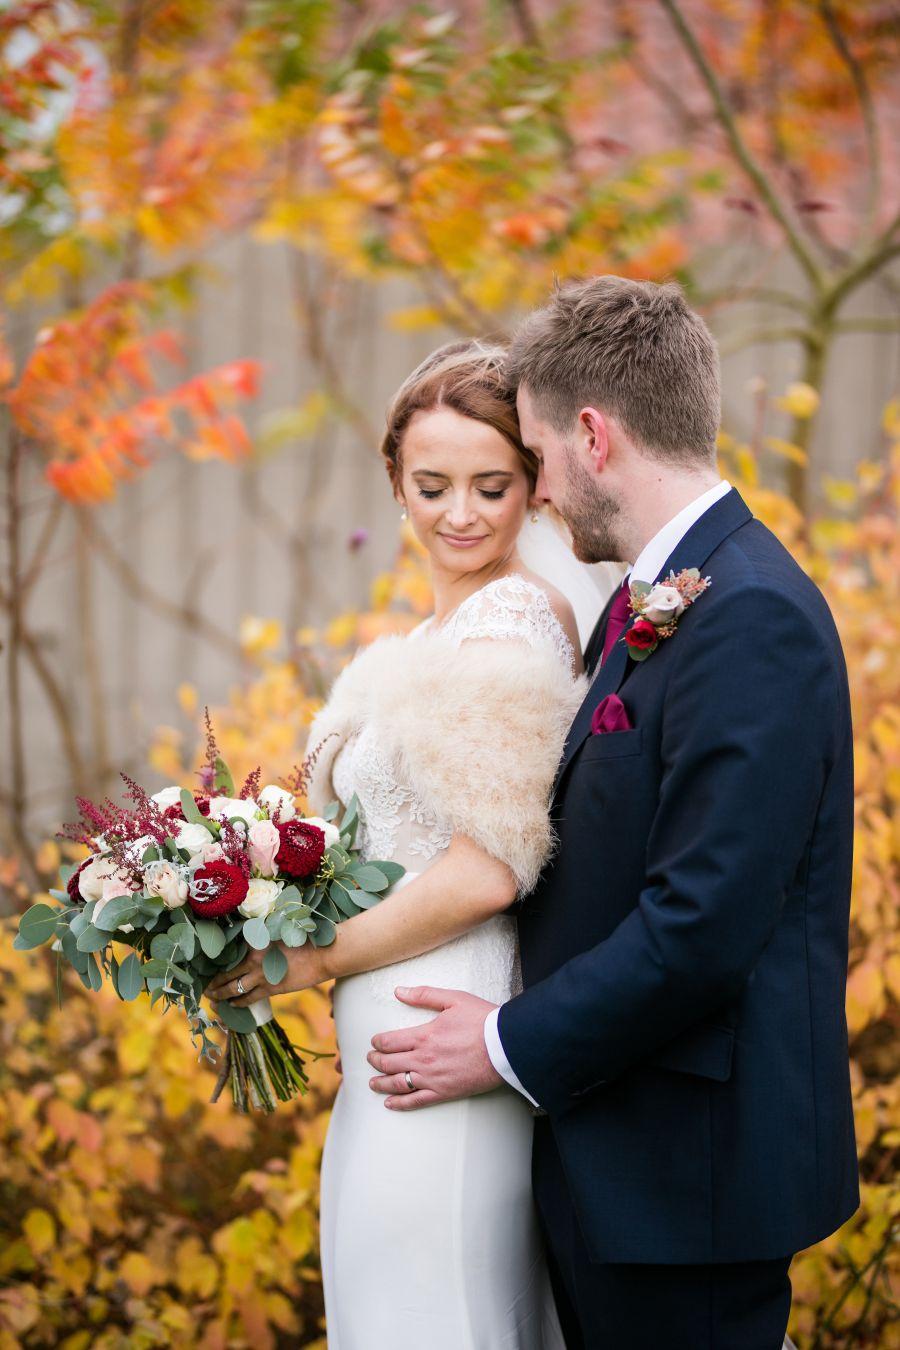 171028_suzie_terry_wedding_525